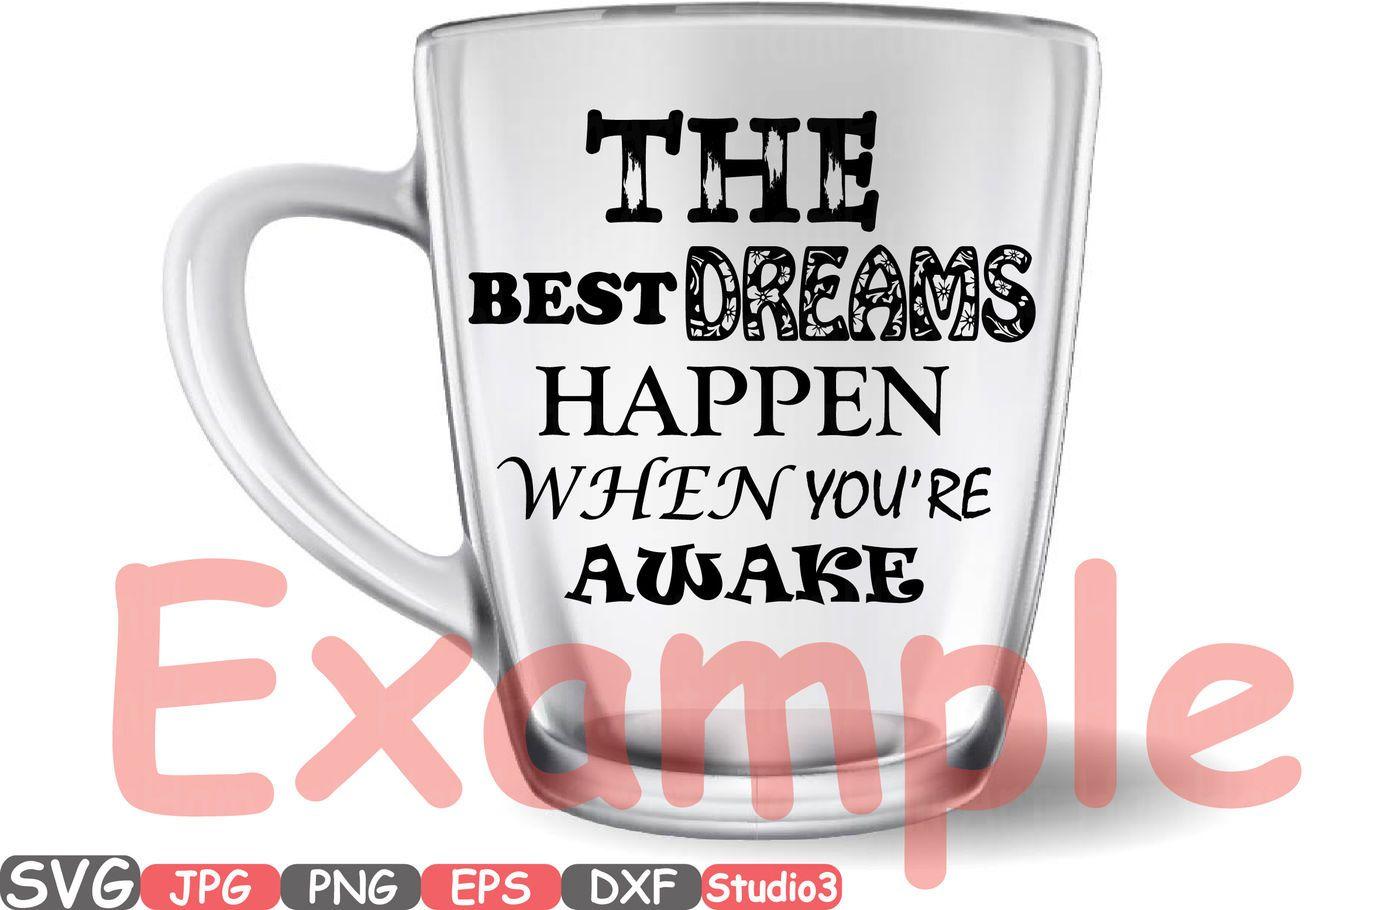 Dream Catcher The Best Dreams Happen When You Re Awake Quote Sayings Silhouette Studio 3 Cameo Svg Word Art Clipa Brochure Design Template Awake Quote Word Art